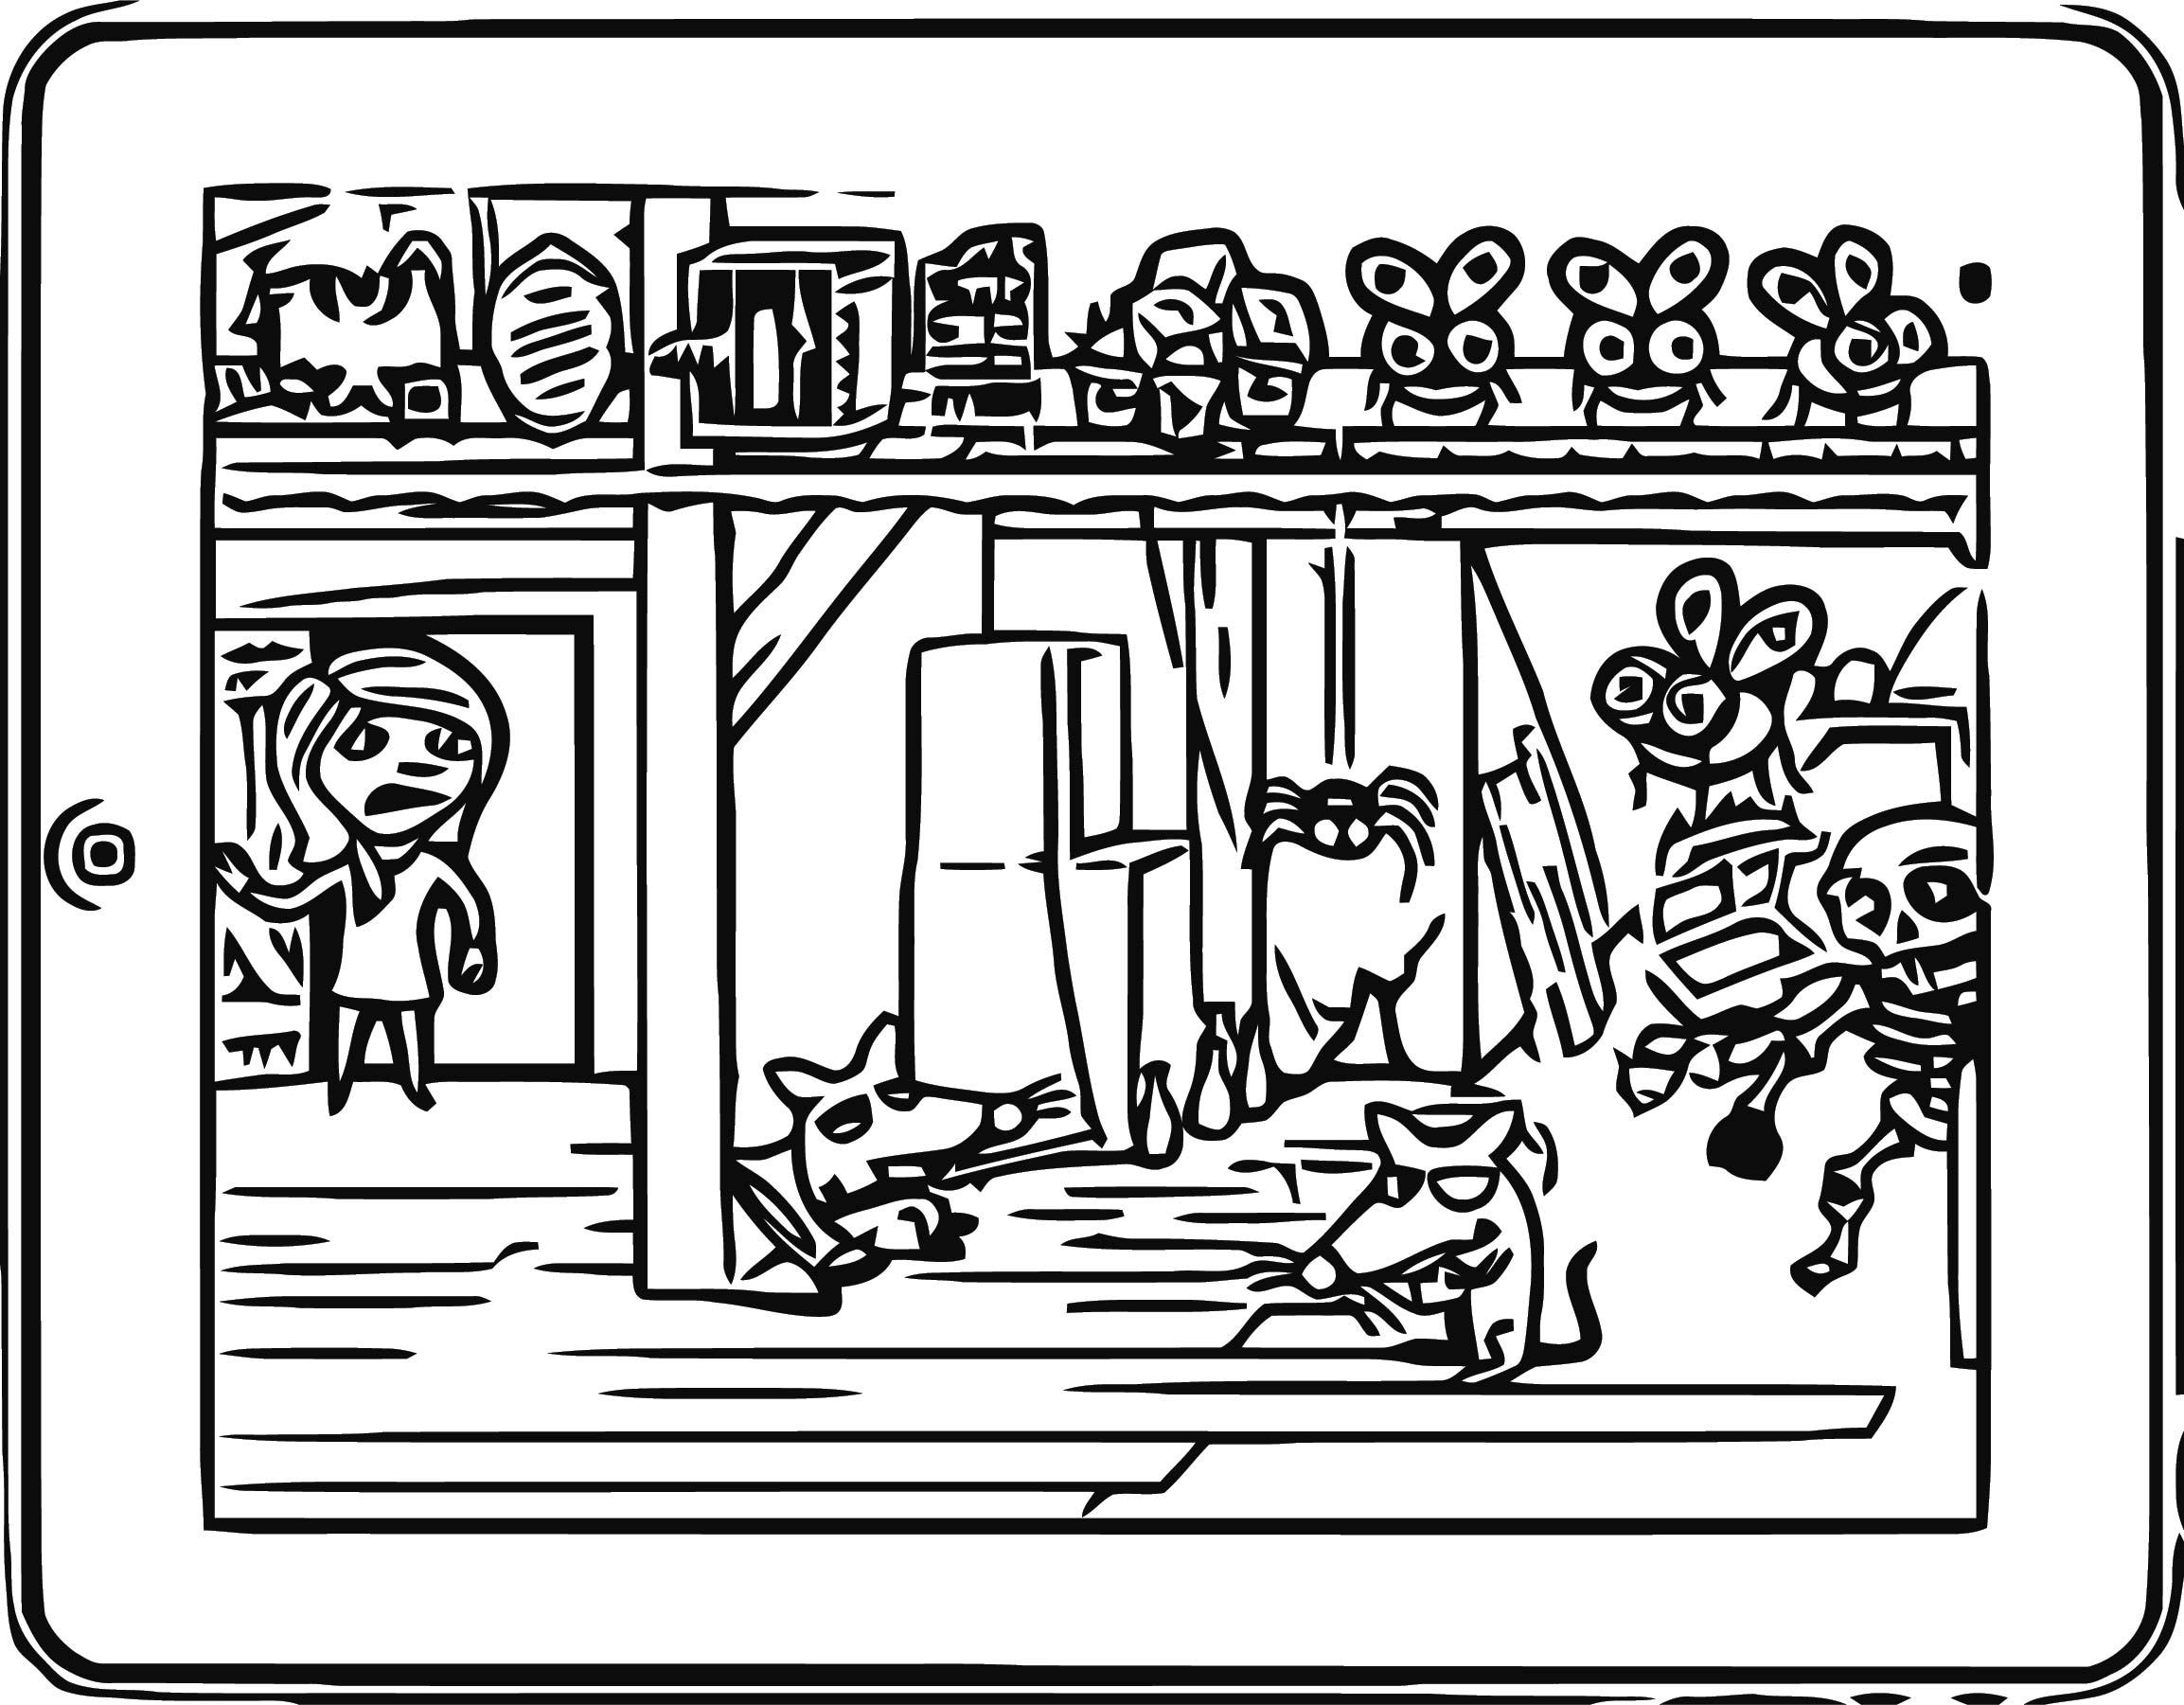 Ipad Jajdo3 Cartoonize Coloring Page